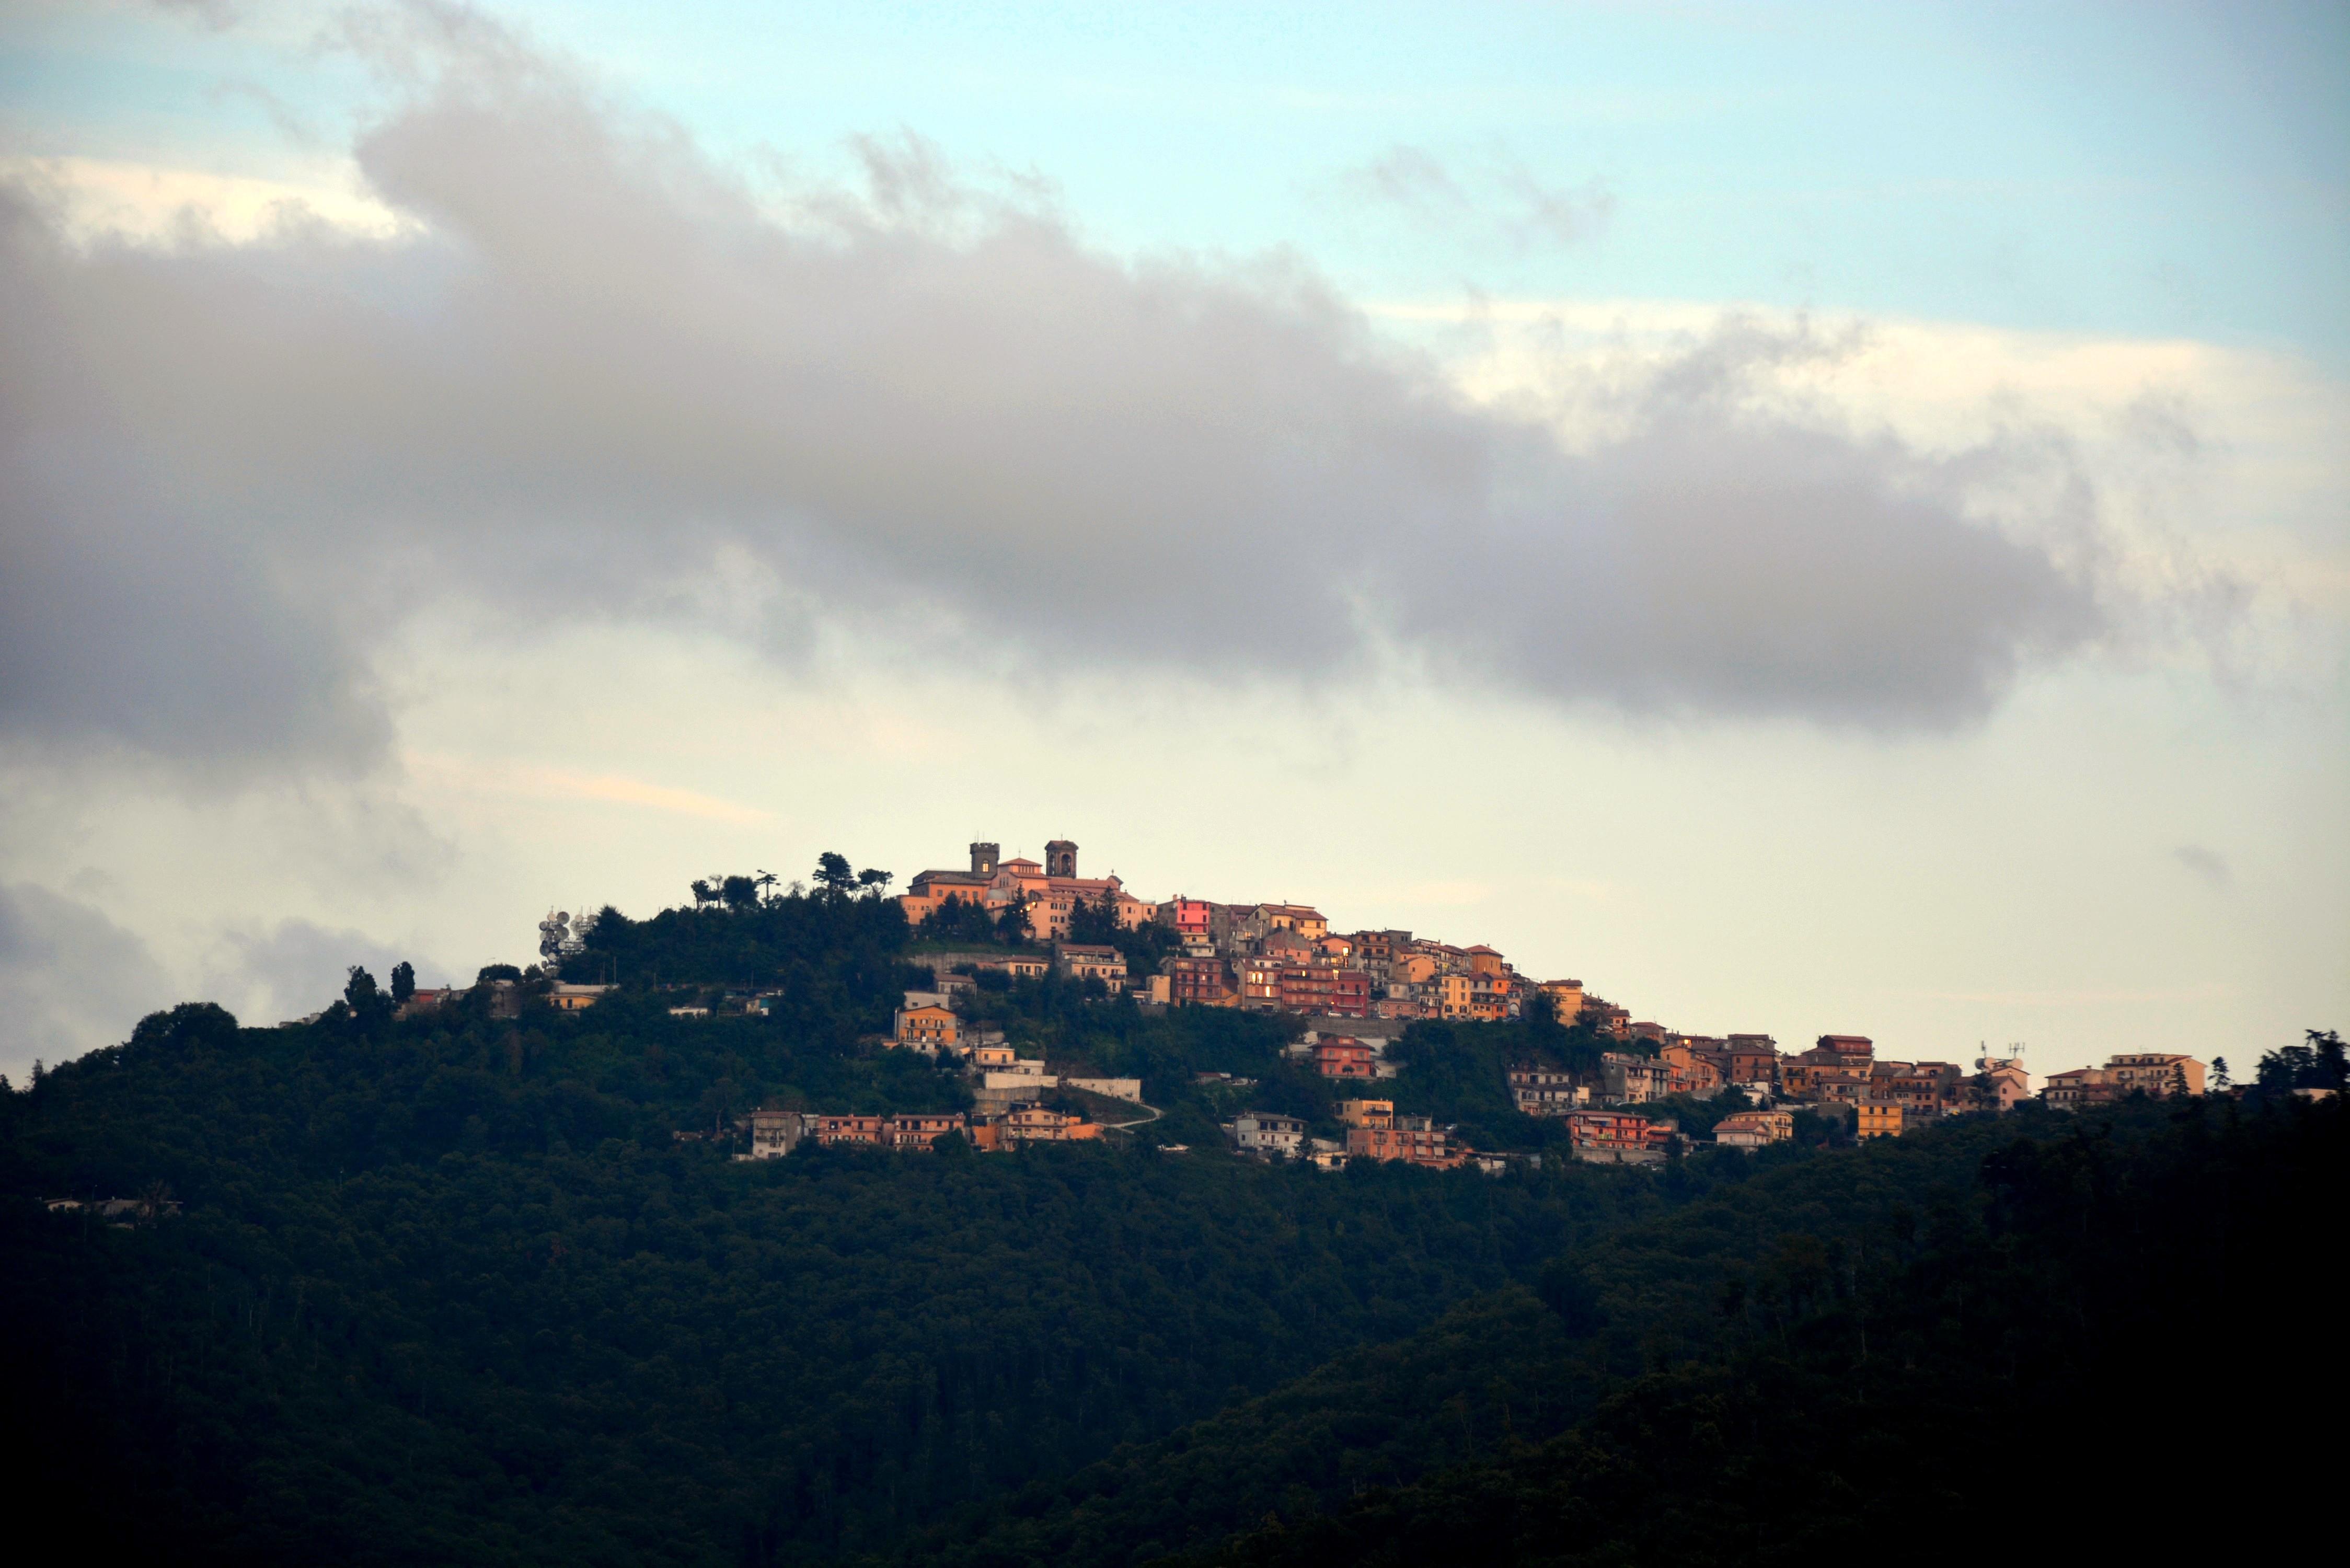 Montecompatri, landscape